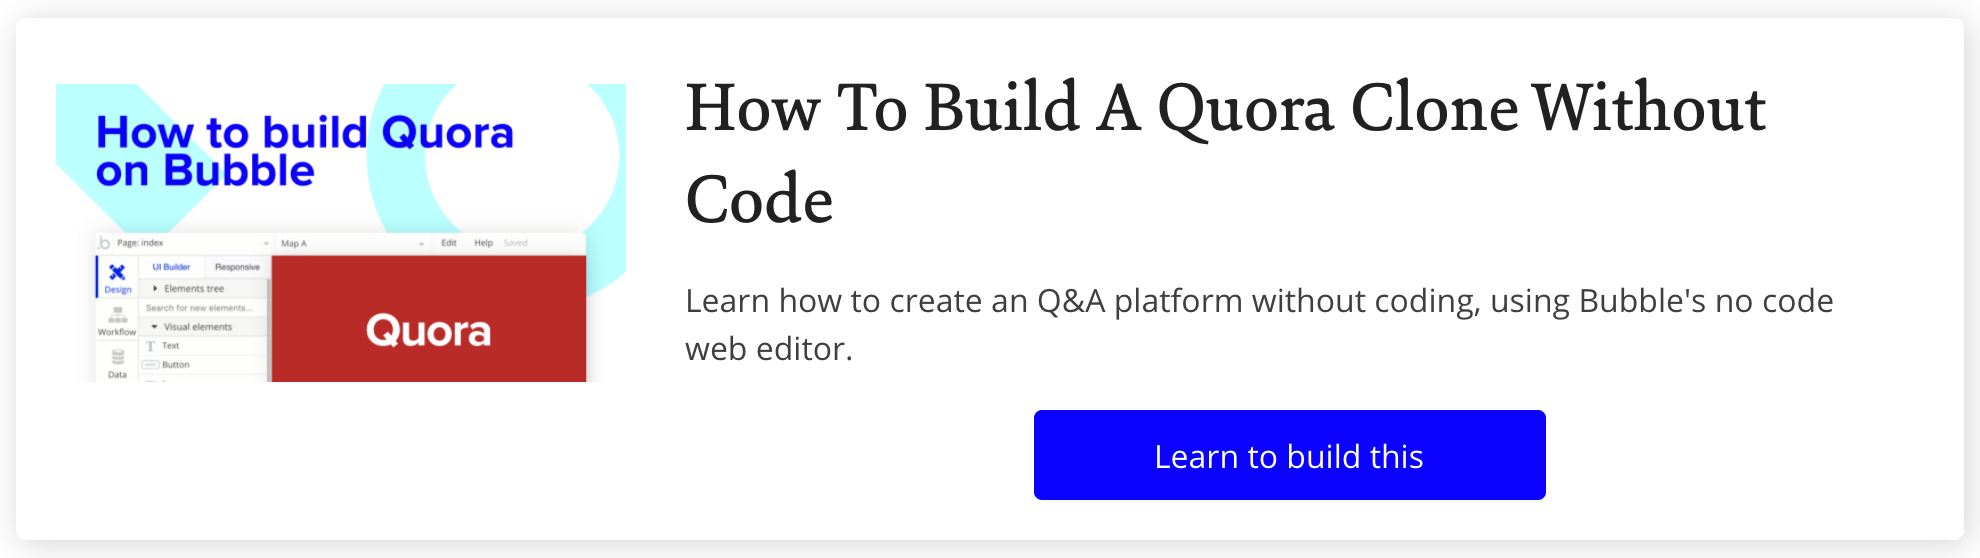 How-To-Build-Quora-Clone-Bubble